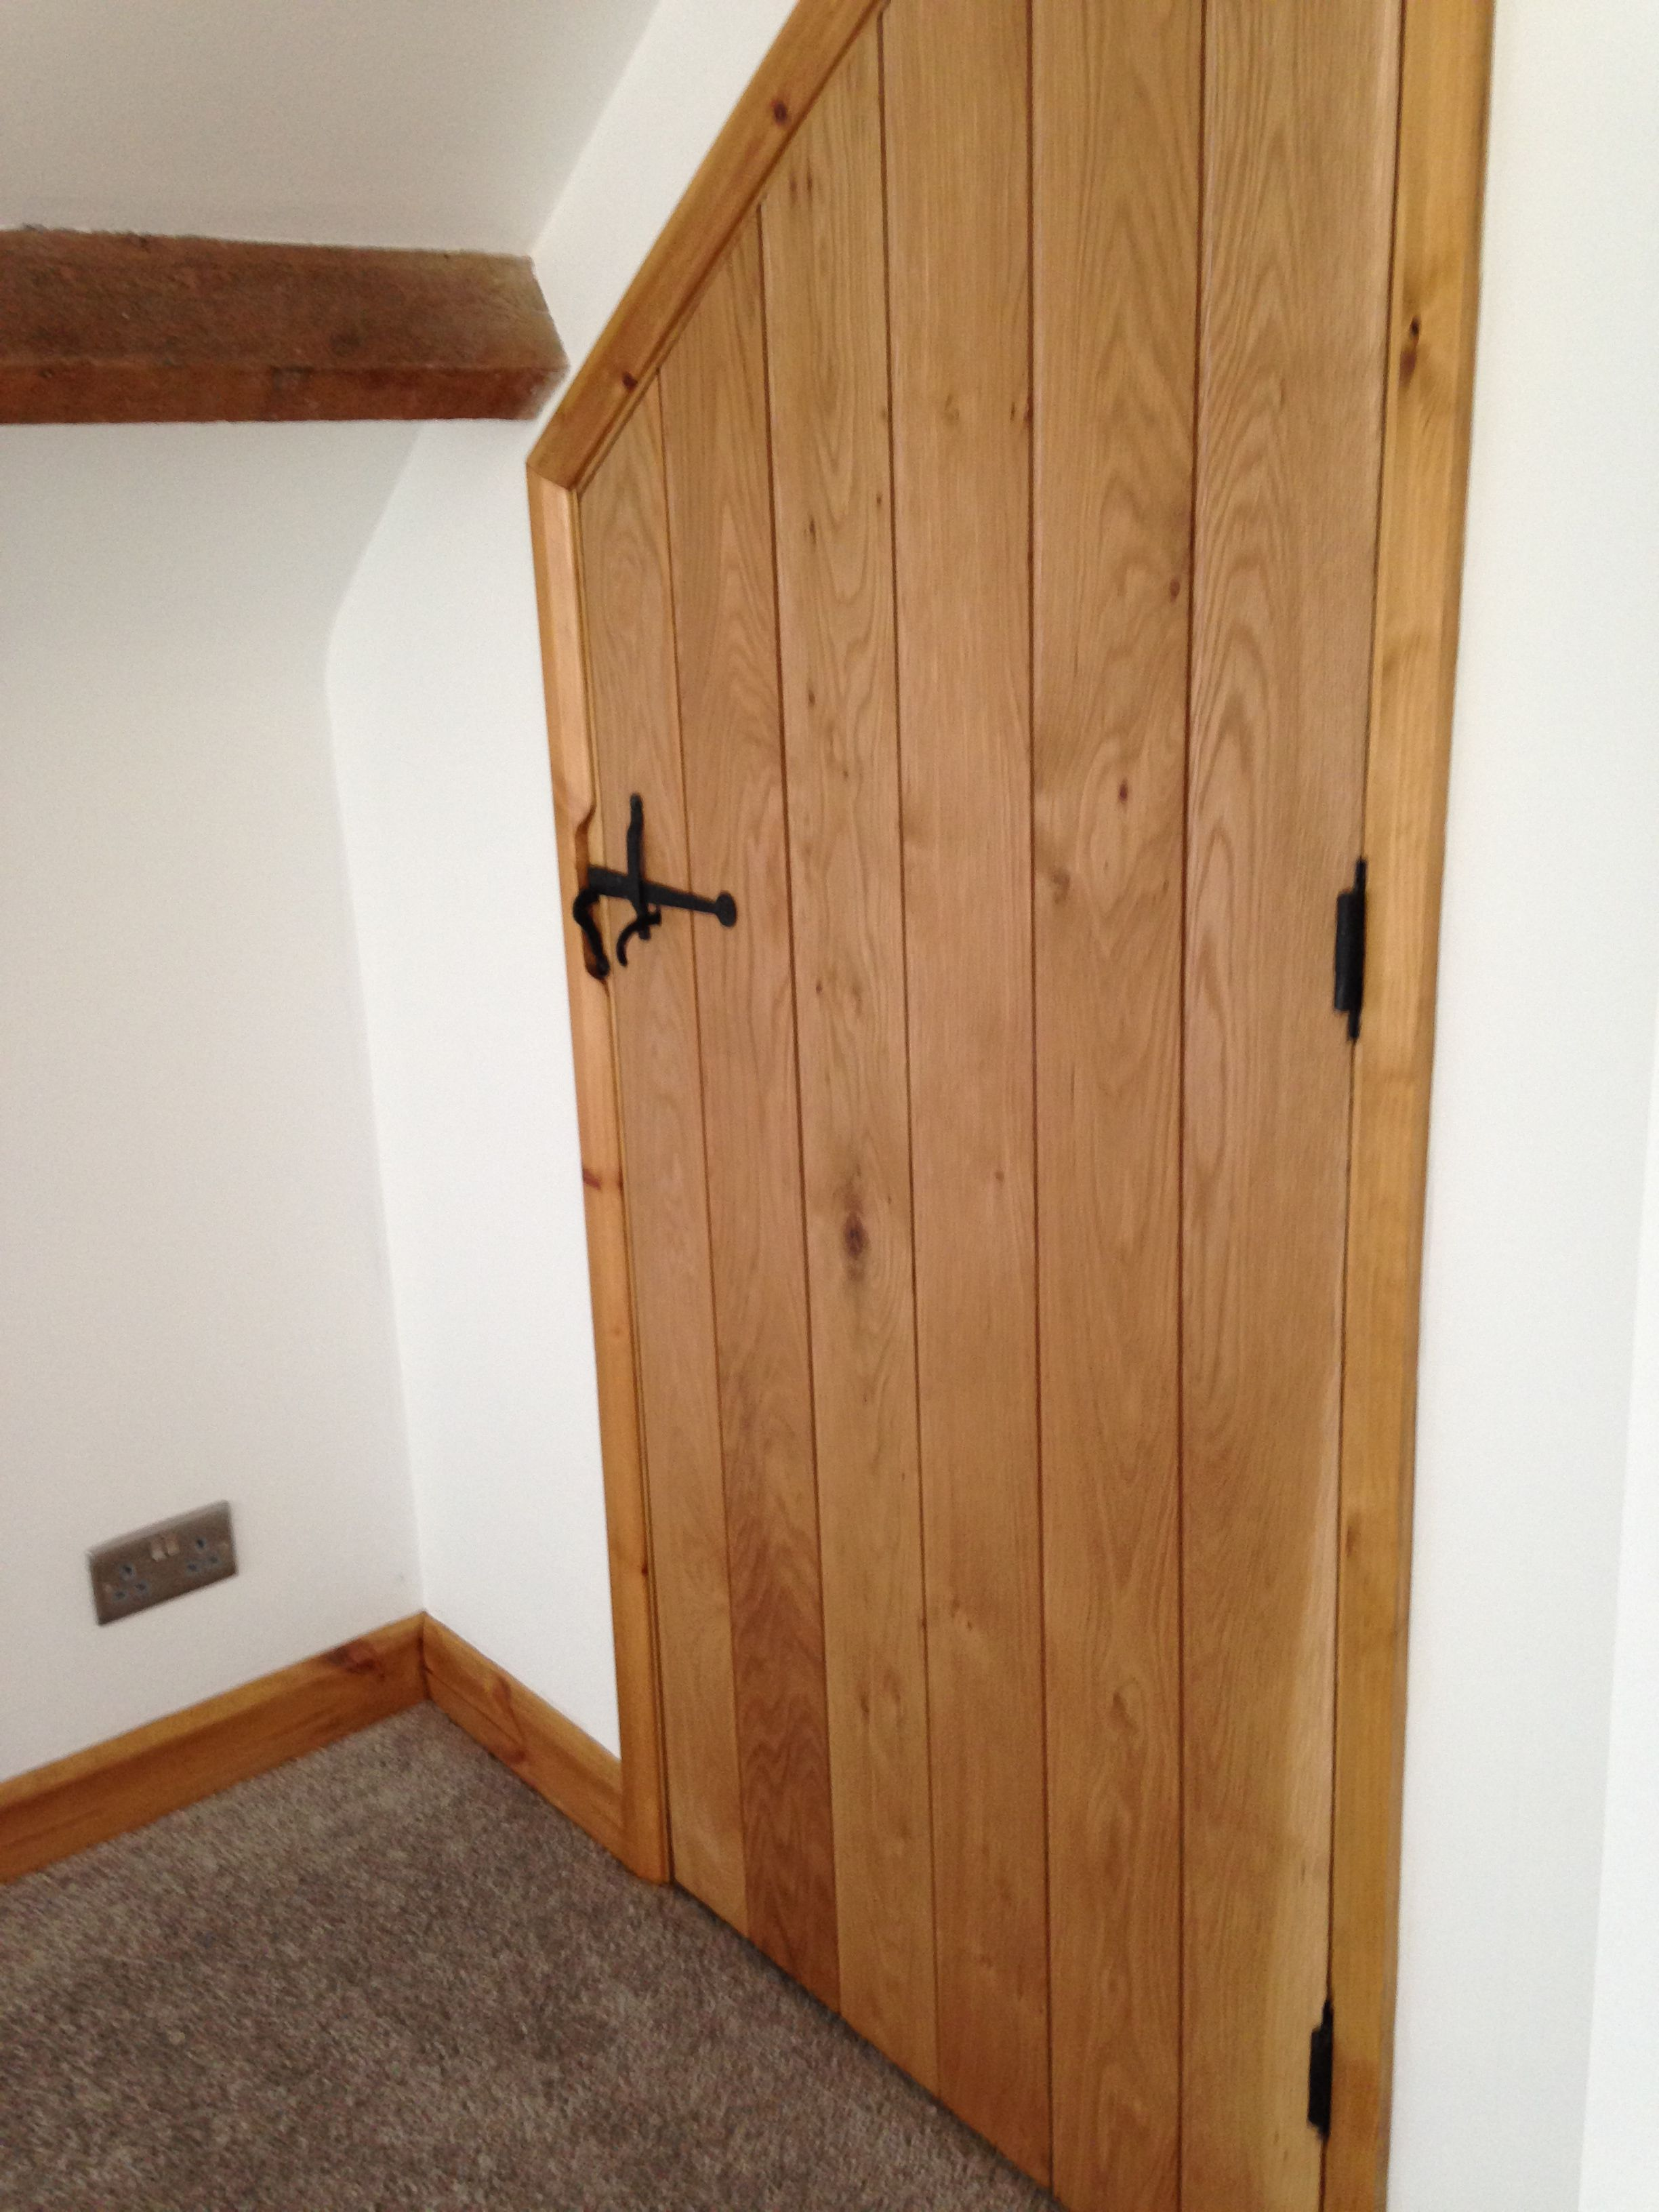 Ledge and brace oak doors - Solid Oak Ledge Brace Door Trim To The Size You Need As It S 100